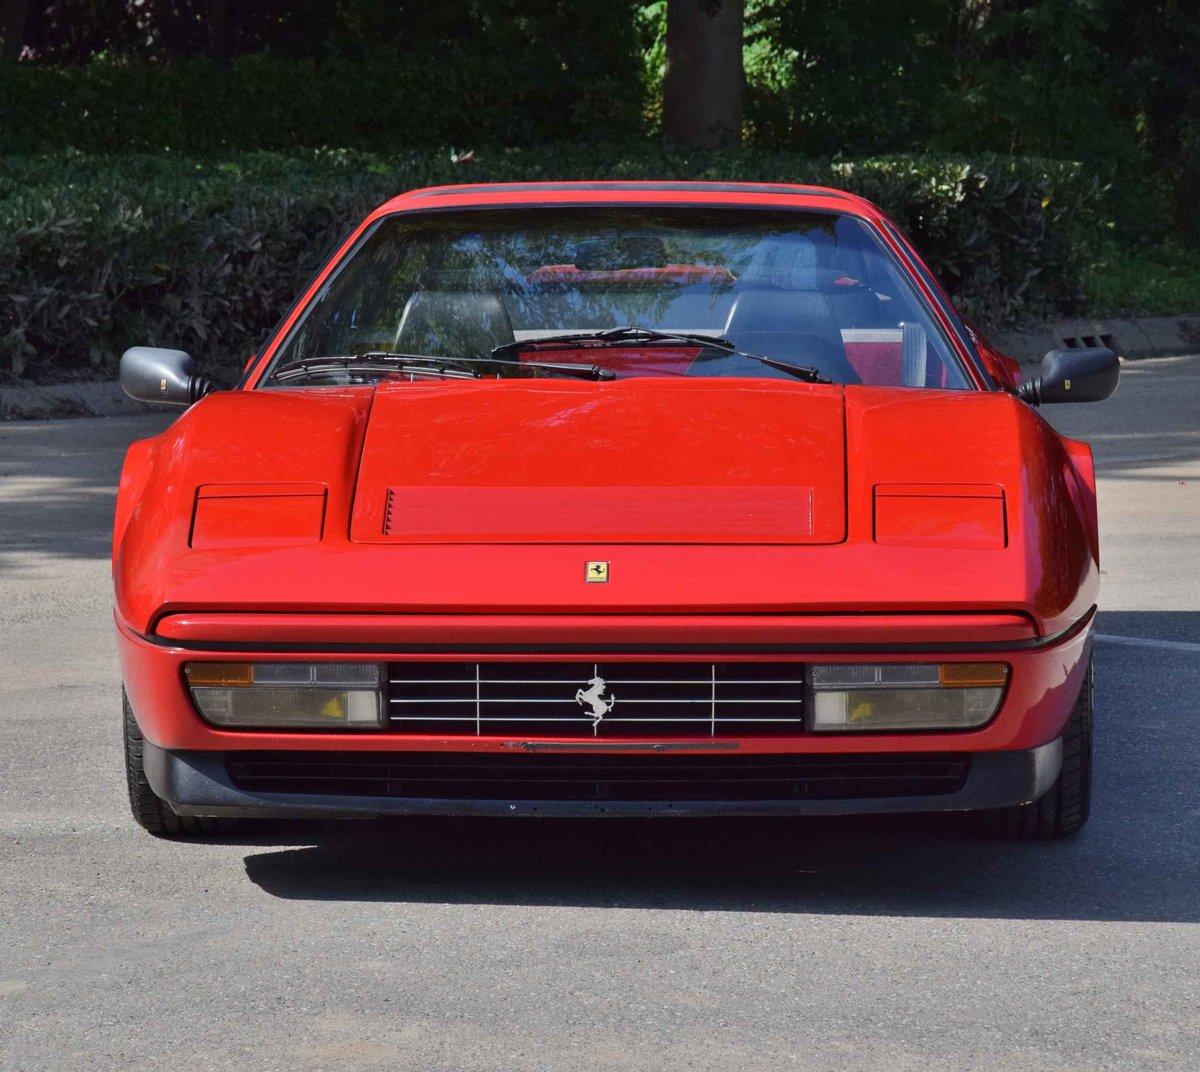 Ferrari 328 GTS Quattrovalvole (1987) convertible red 270 hp For Sale (picture 6 of 6)